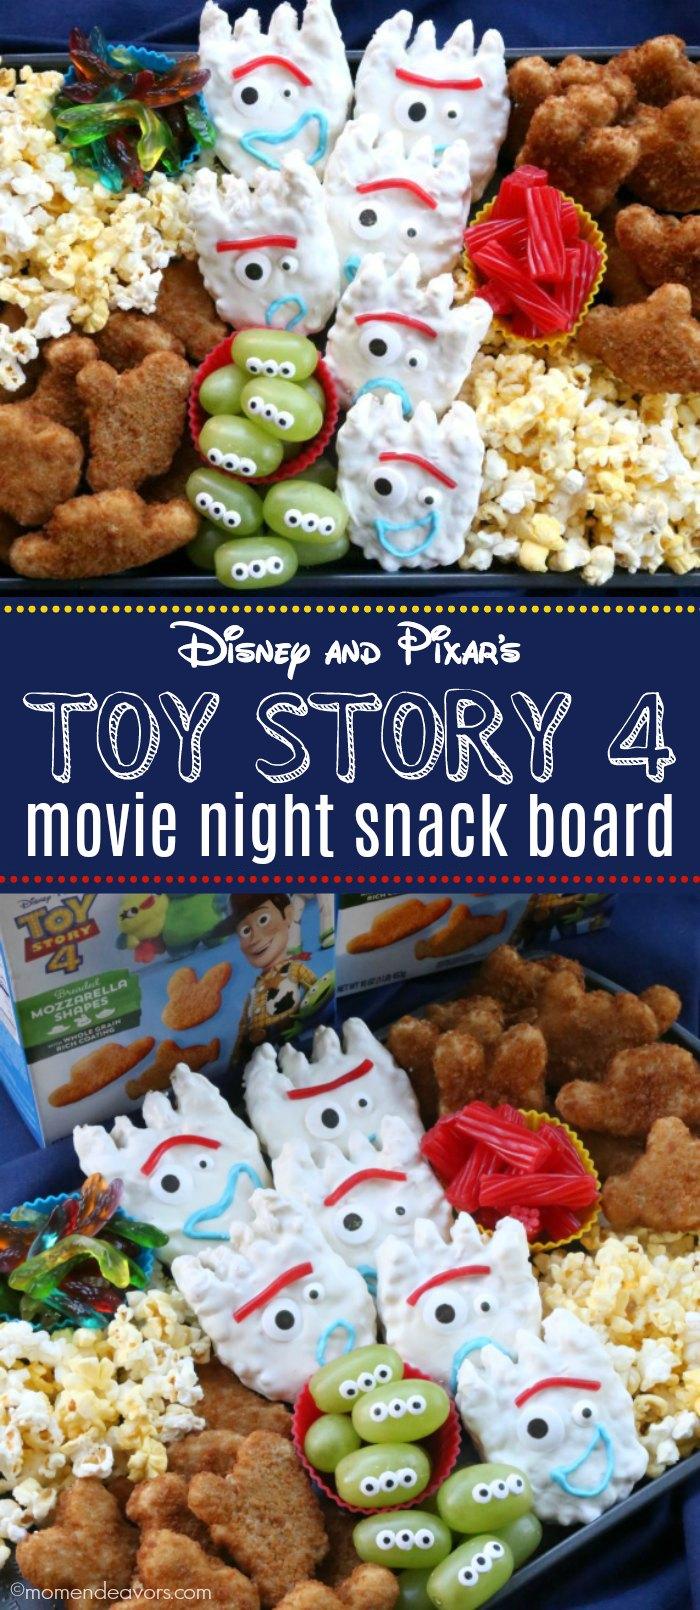 Disney and Pixar's Toy Story 4 Movie Night Snack Board #movienightsnacks Disney and Pixar's Toy Story 4 Movie Night Snack Board #movienightsnacks